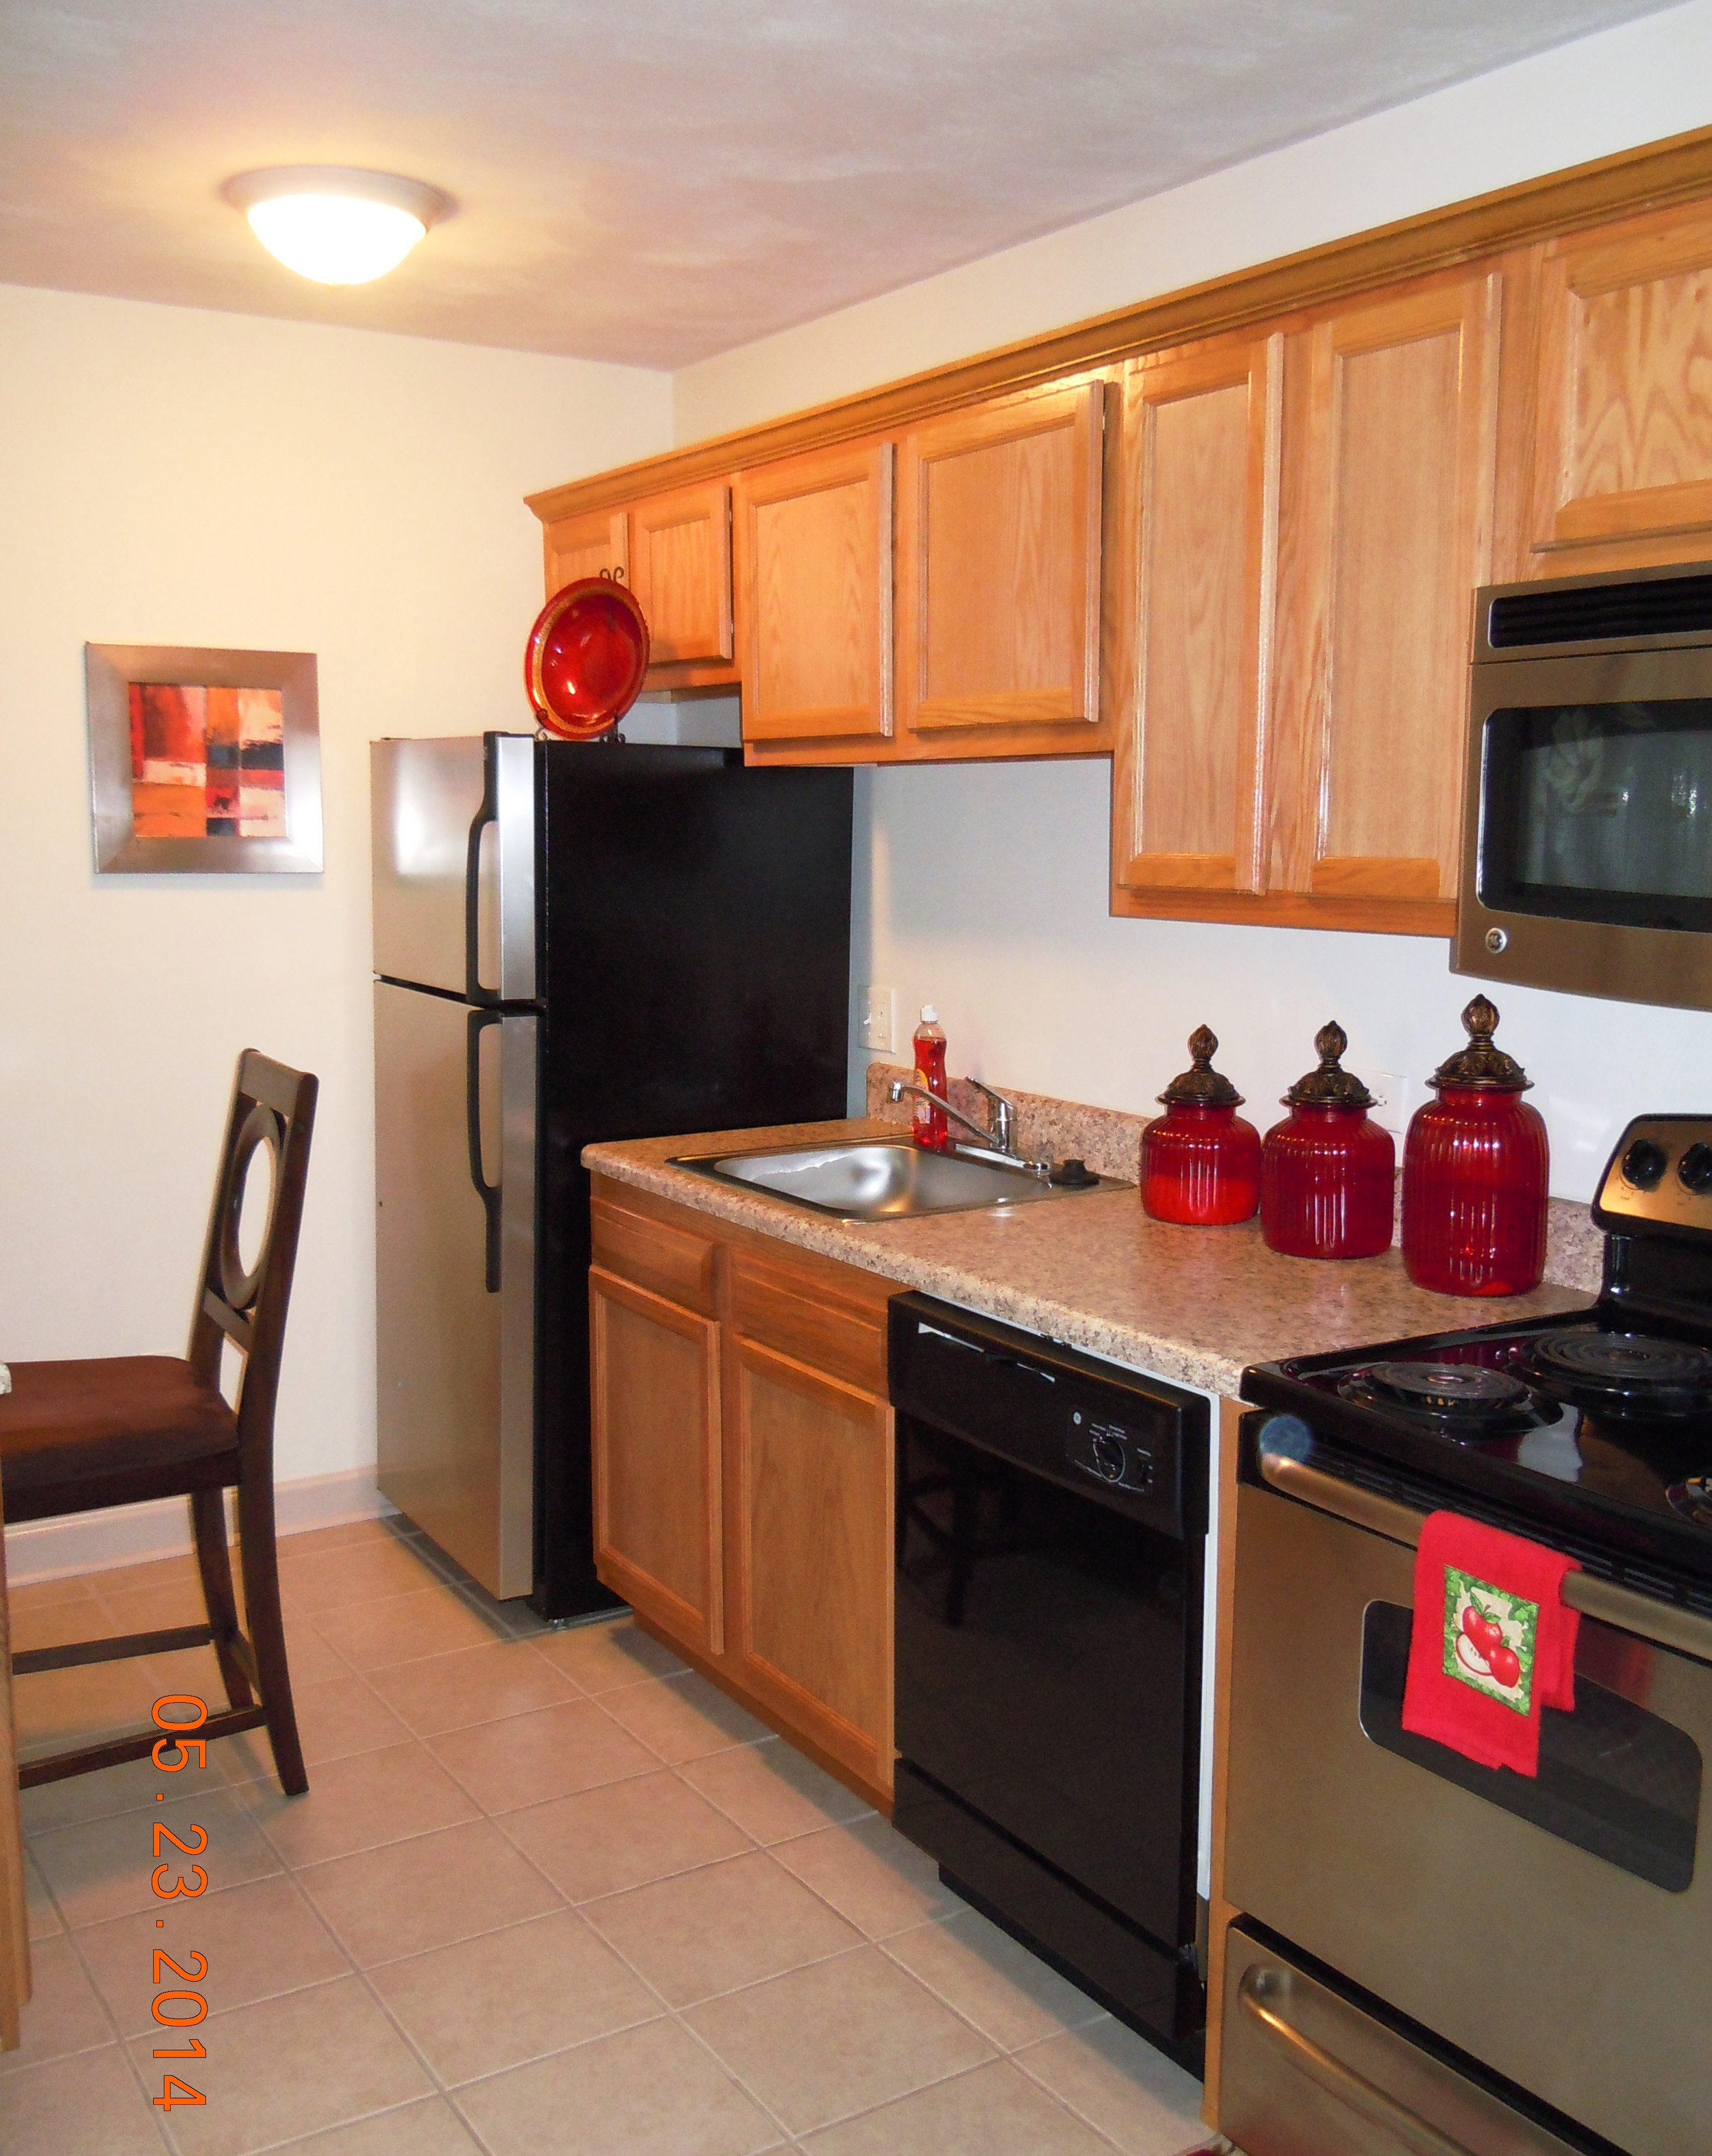 Apartment Guide Pictures (Dodi) 005.jpg